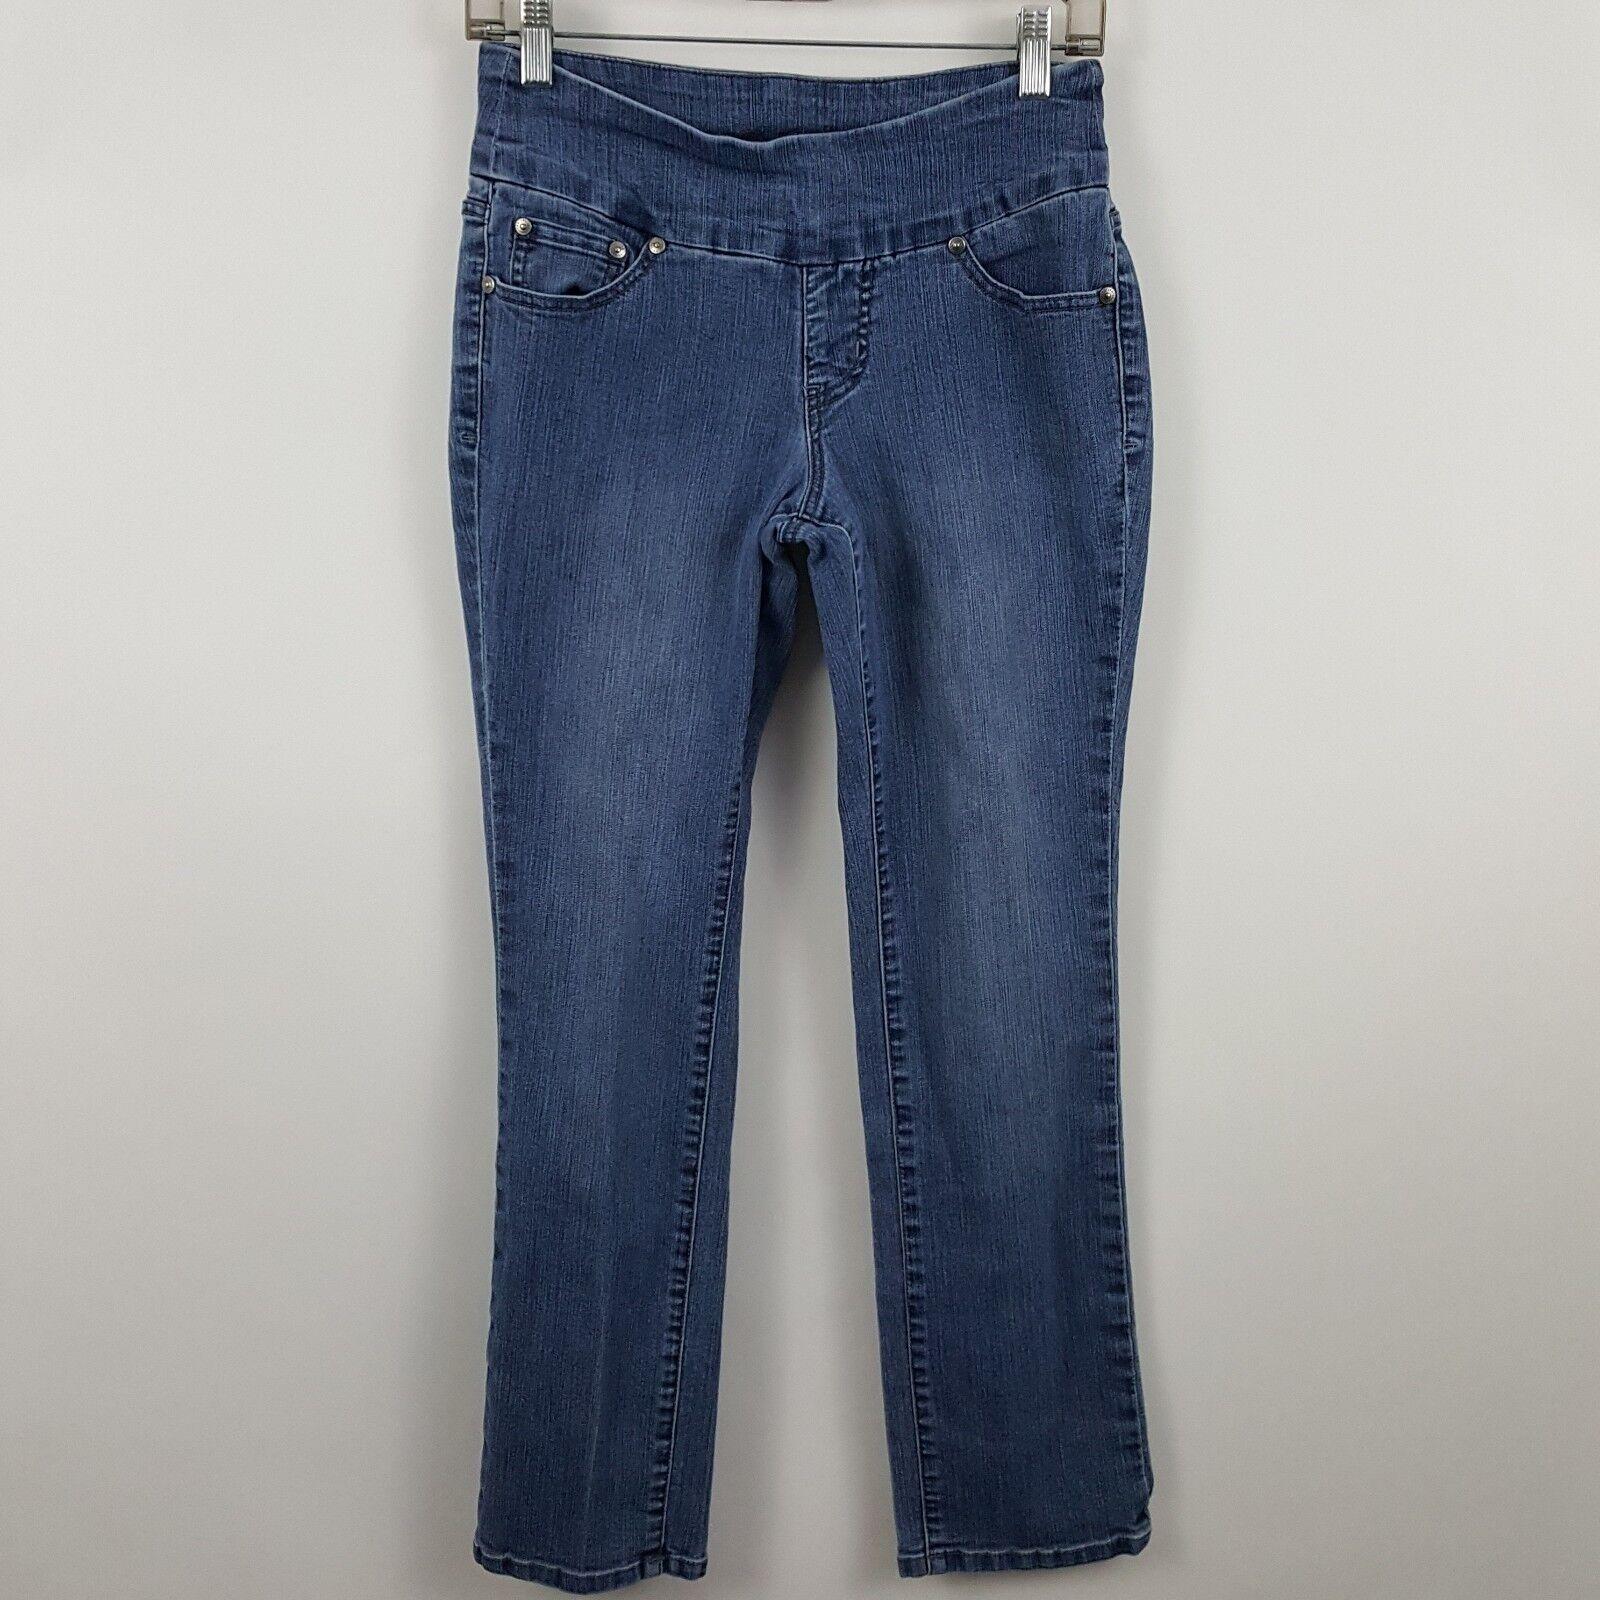 girls-green-petite-straight-leg-jeans-sharon-threesome-video